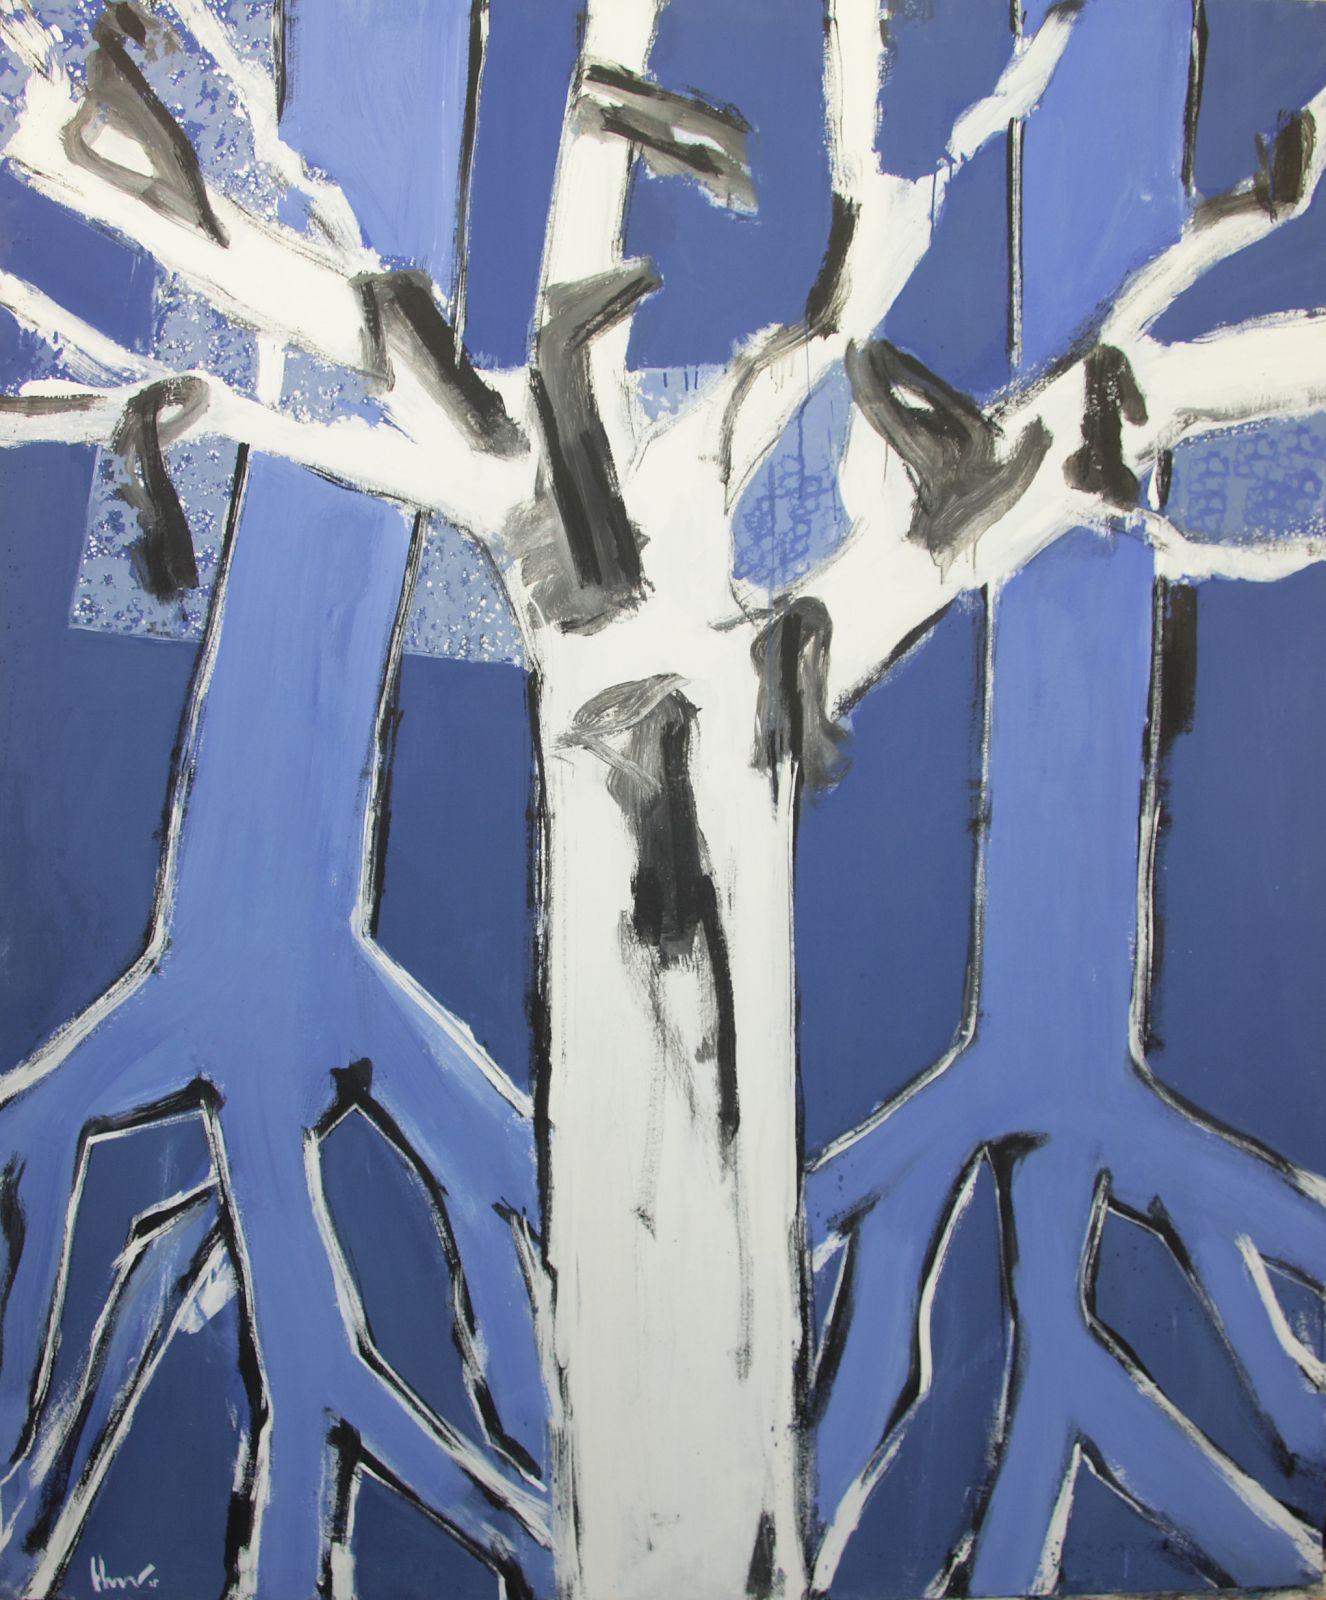 FRUTA DE TEEMPORADA (2005) - Lorenzo Colomo